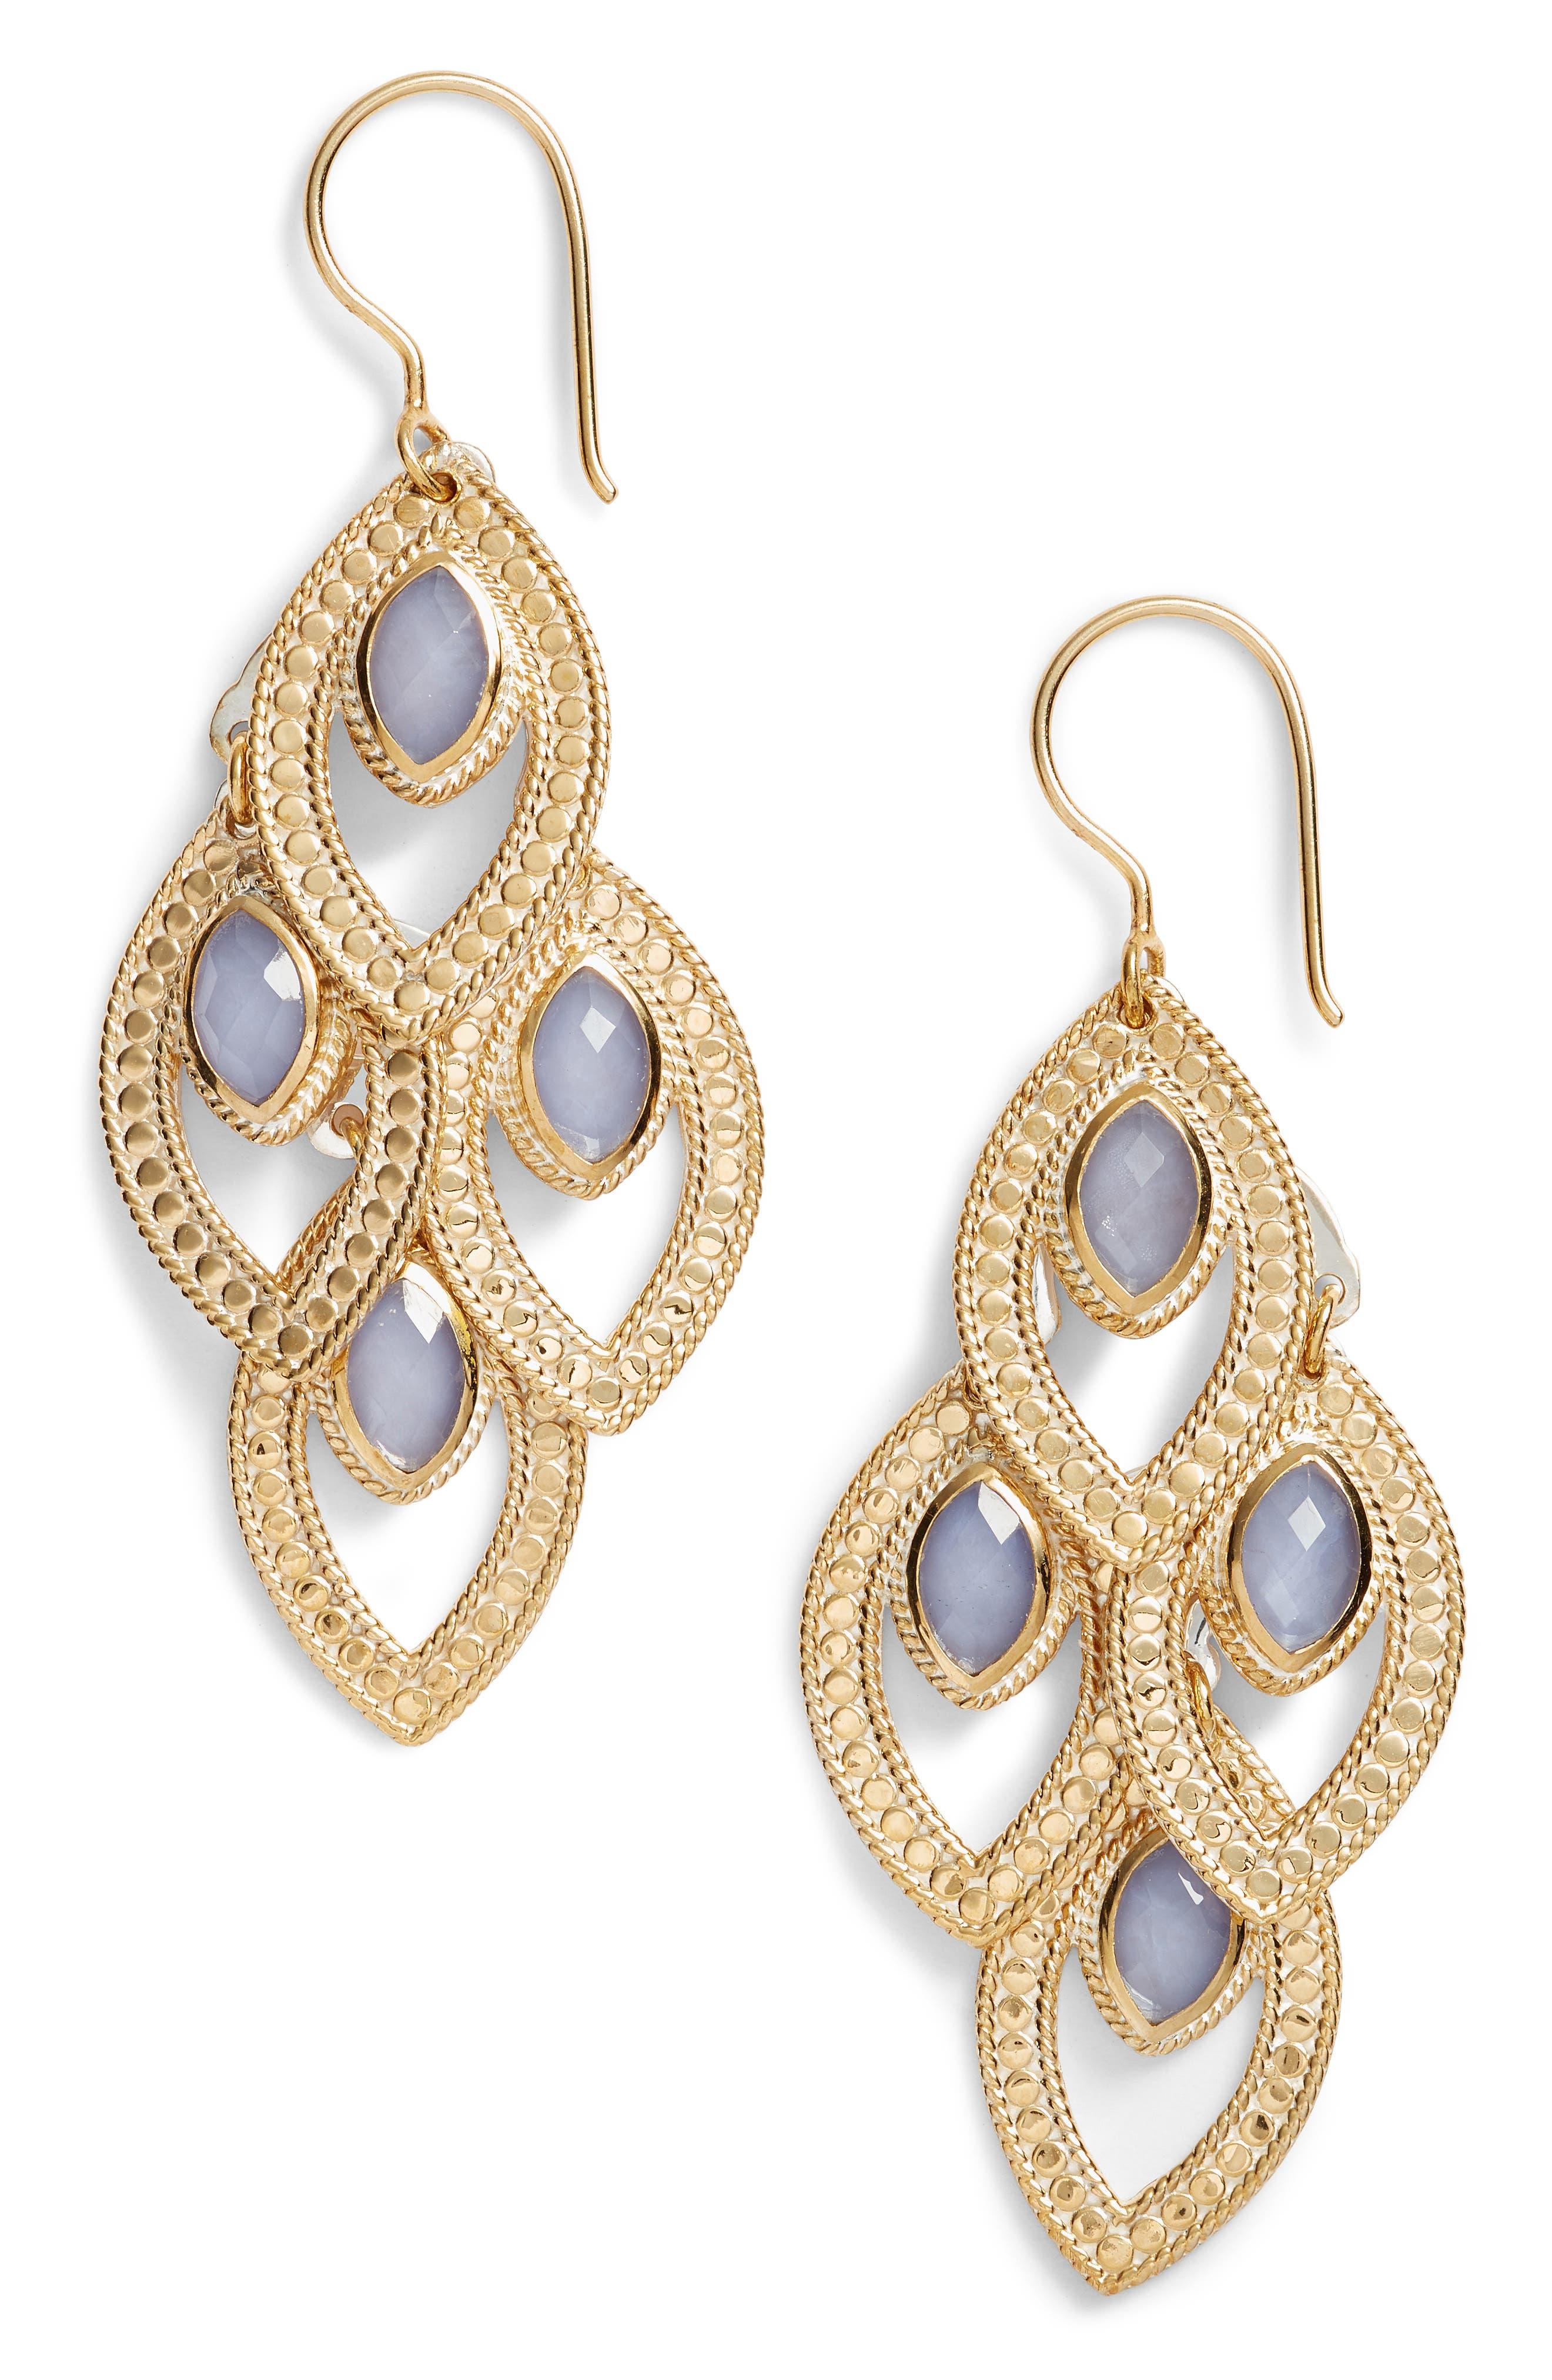 Chandelier Earrings,                             Main thumbnail 1, color,                             Gold/ Blue Chalcedony